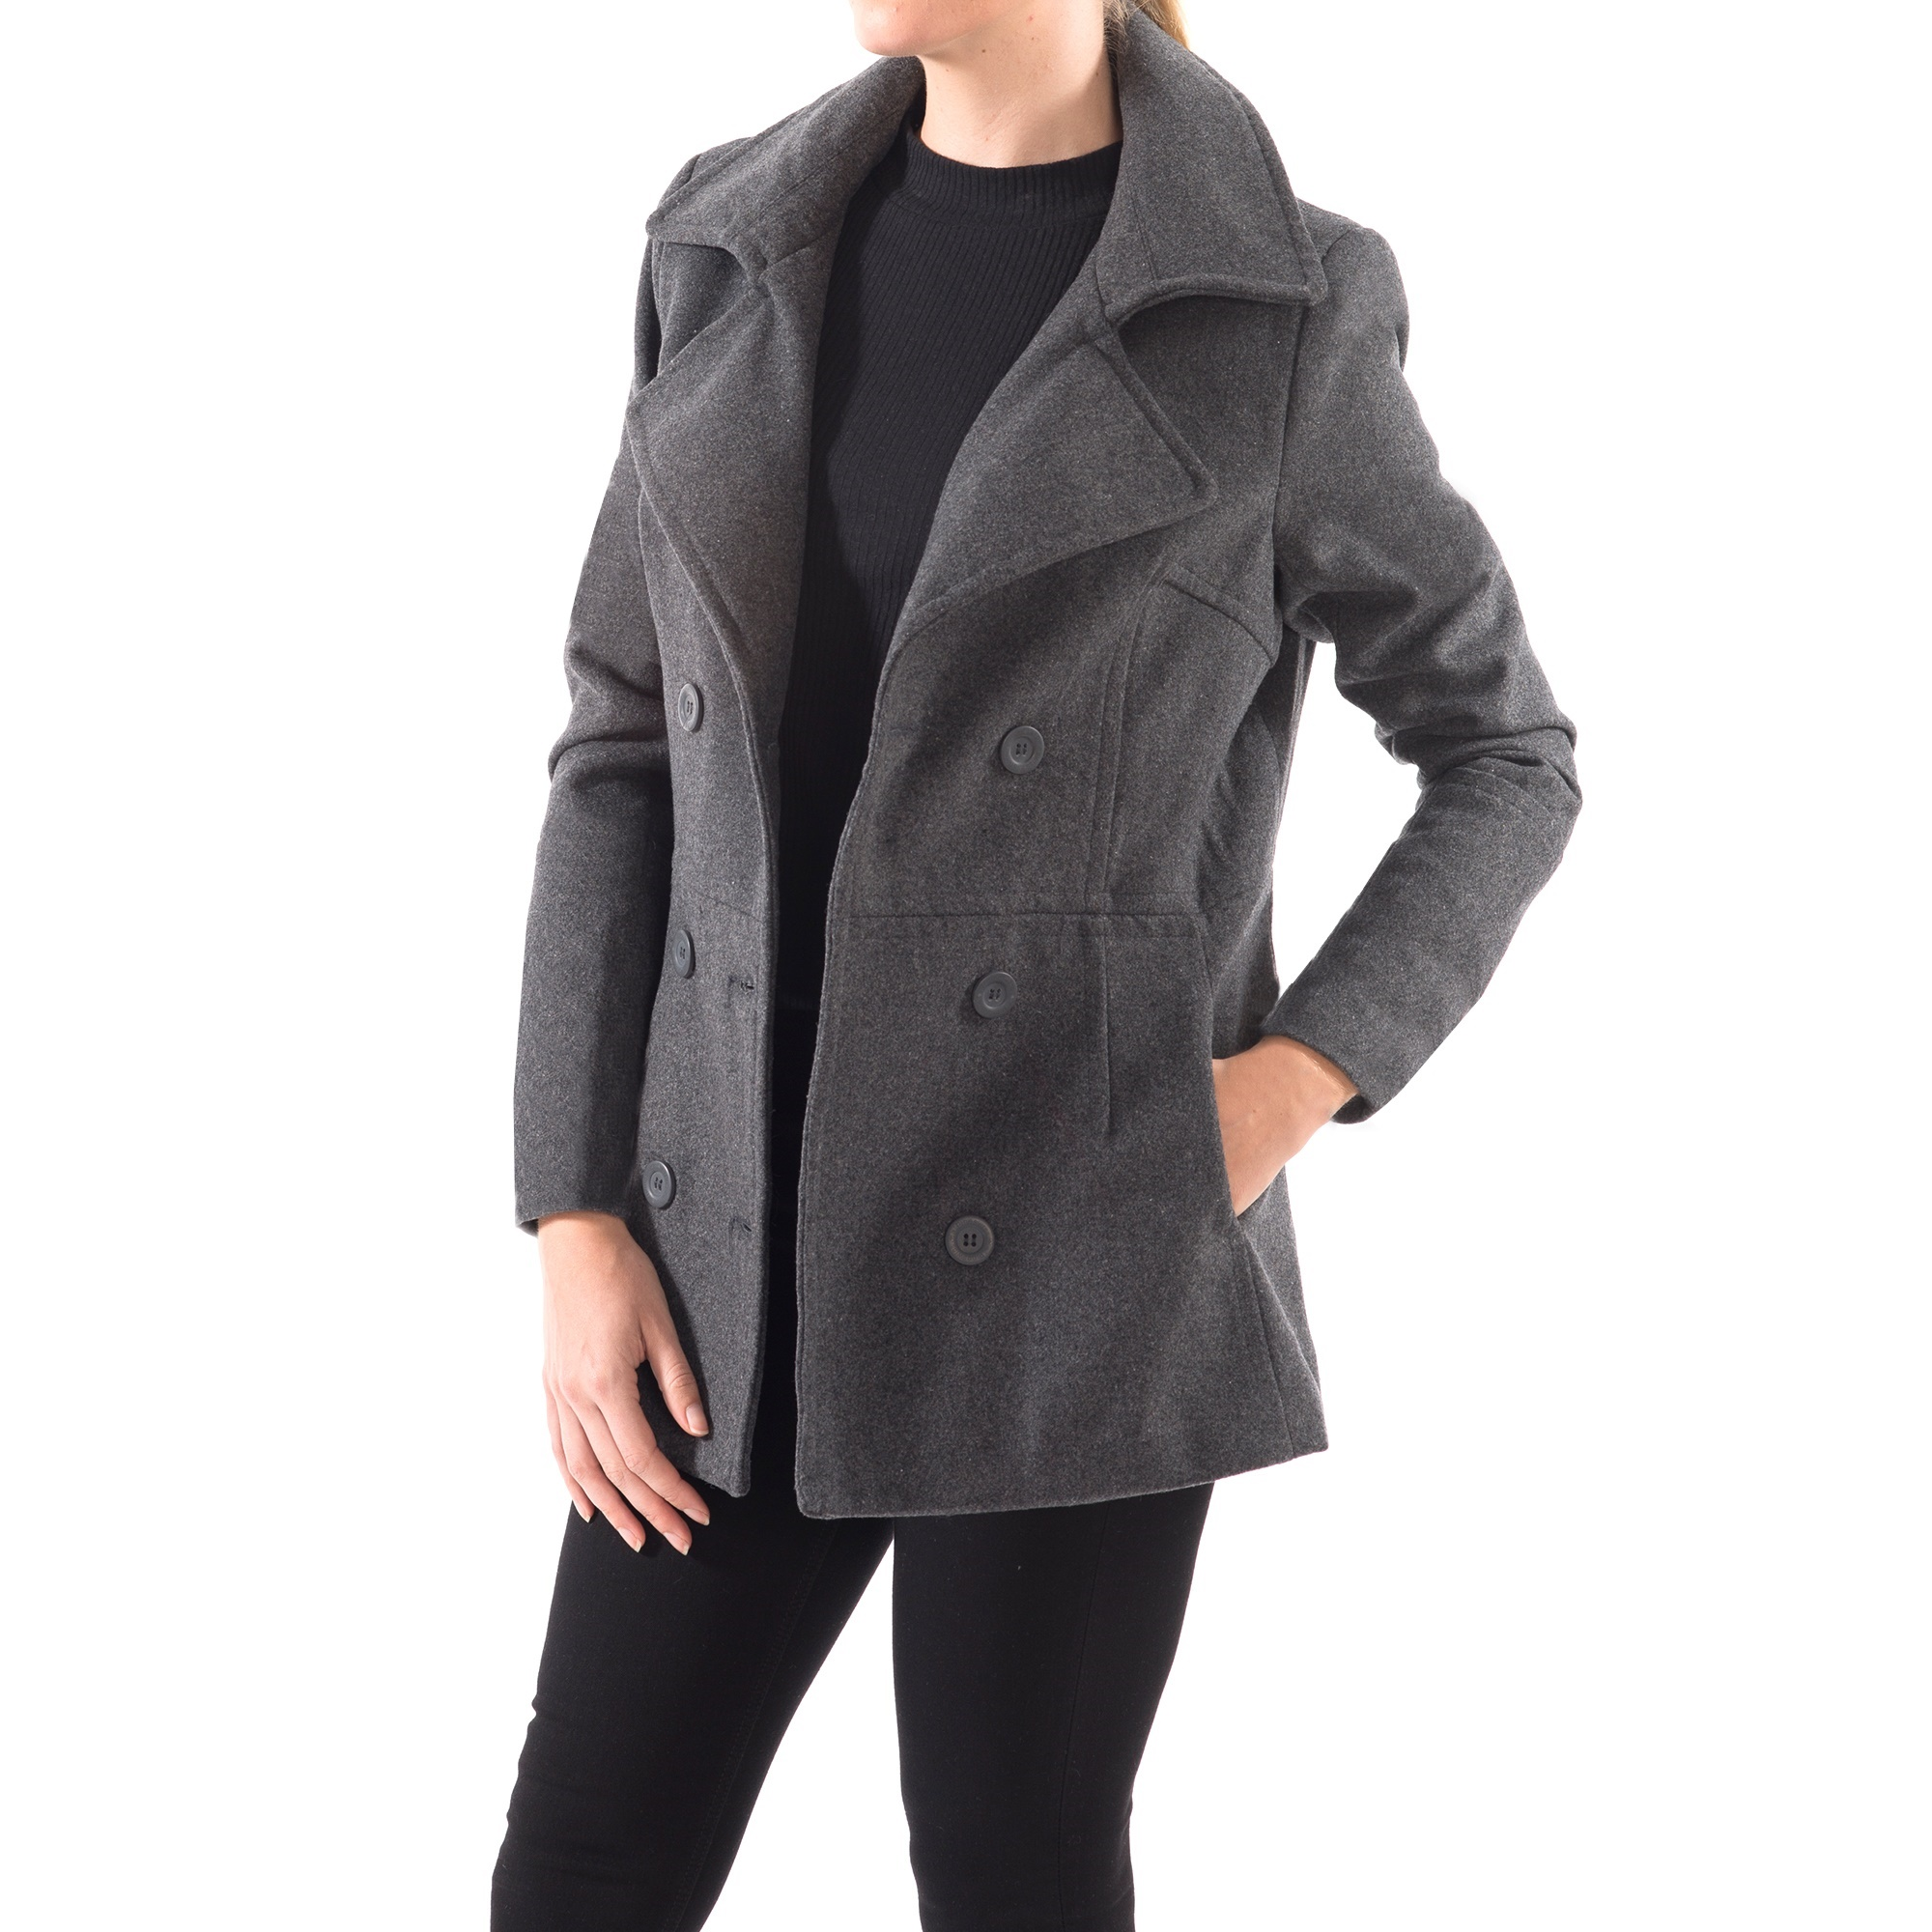 Alpine-Swiss-Emma-Womens-Peacoat-Jacket-Wool-Blazer-Double-Breasted-Overcoat-New thumbnail 40